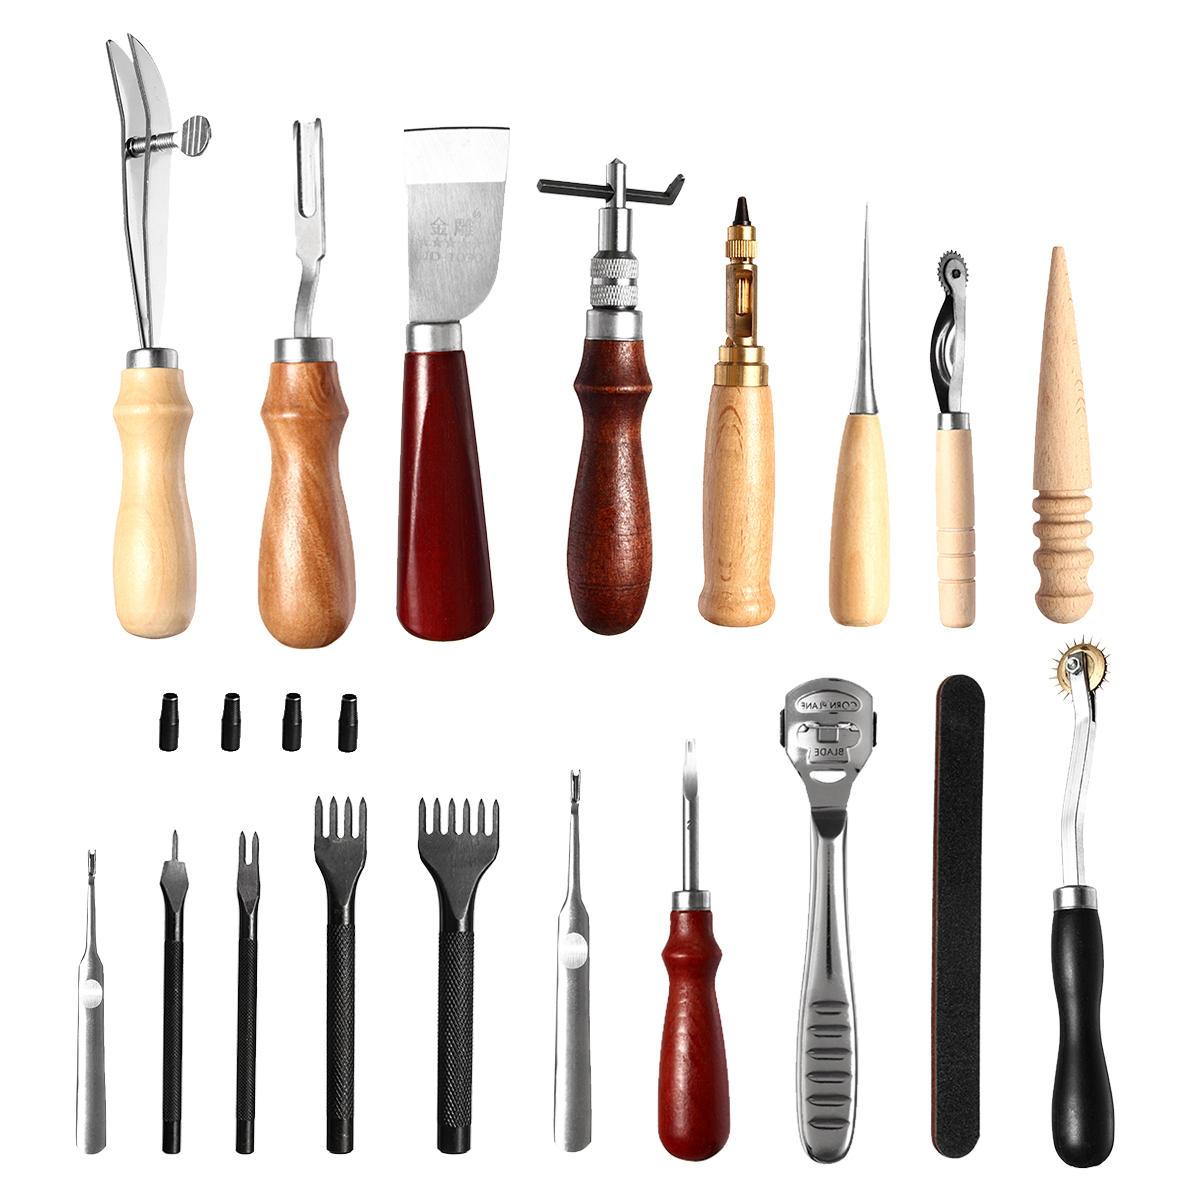 20Pcs Needle File Set Jeweler Wood Carving Steel Hand Tools Kit DIY with Bag - 1